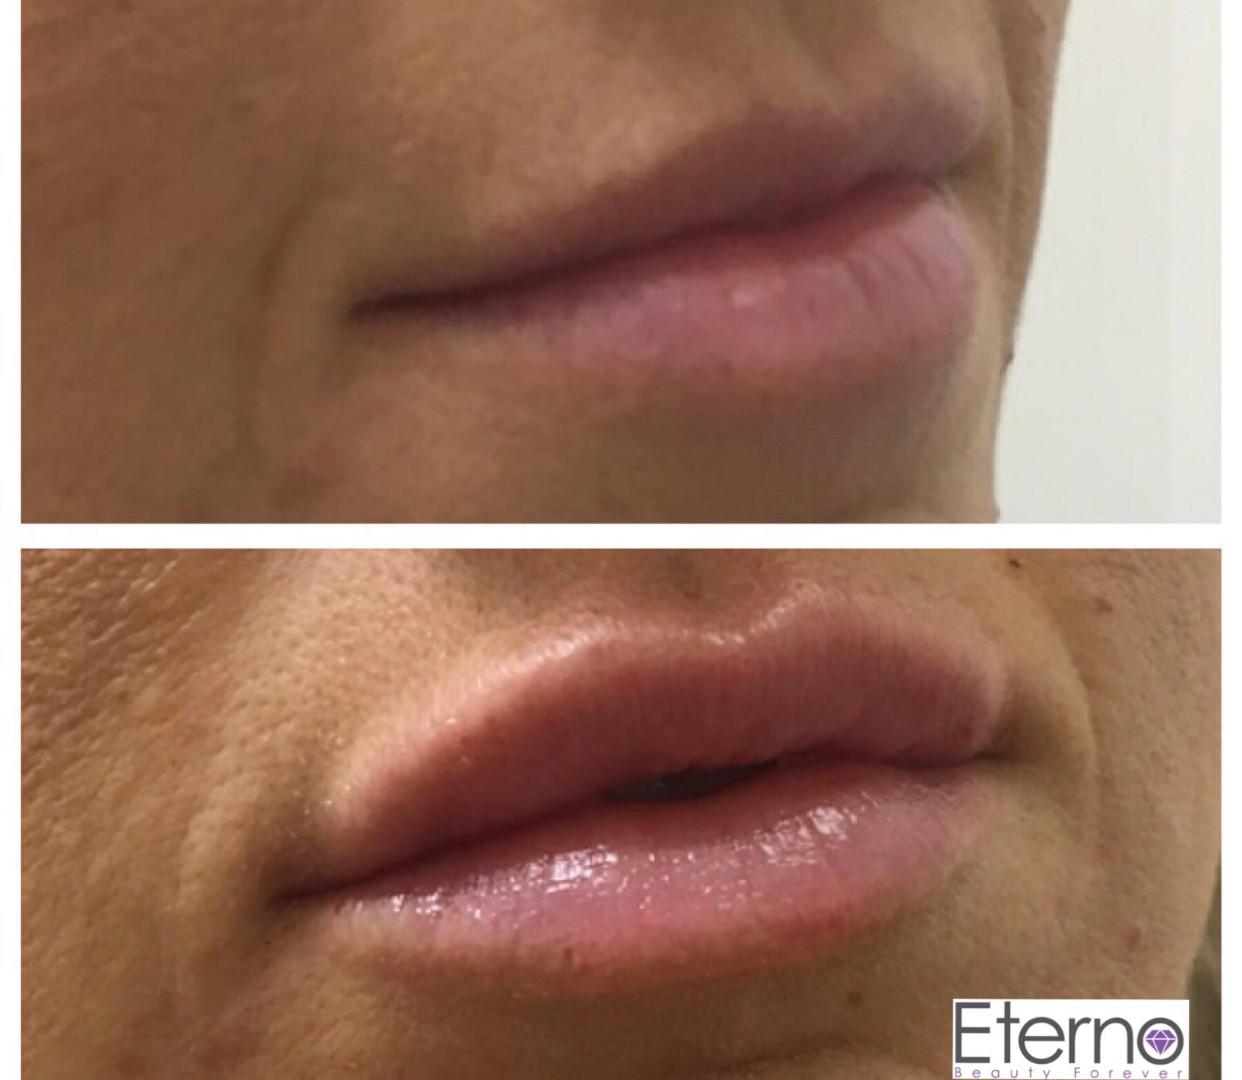 Dermal Fillers at Eterno Skin Clinic in Wolverhampton